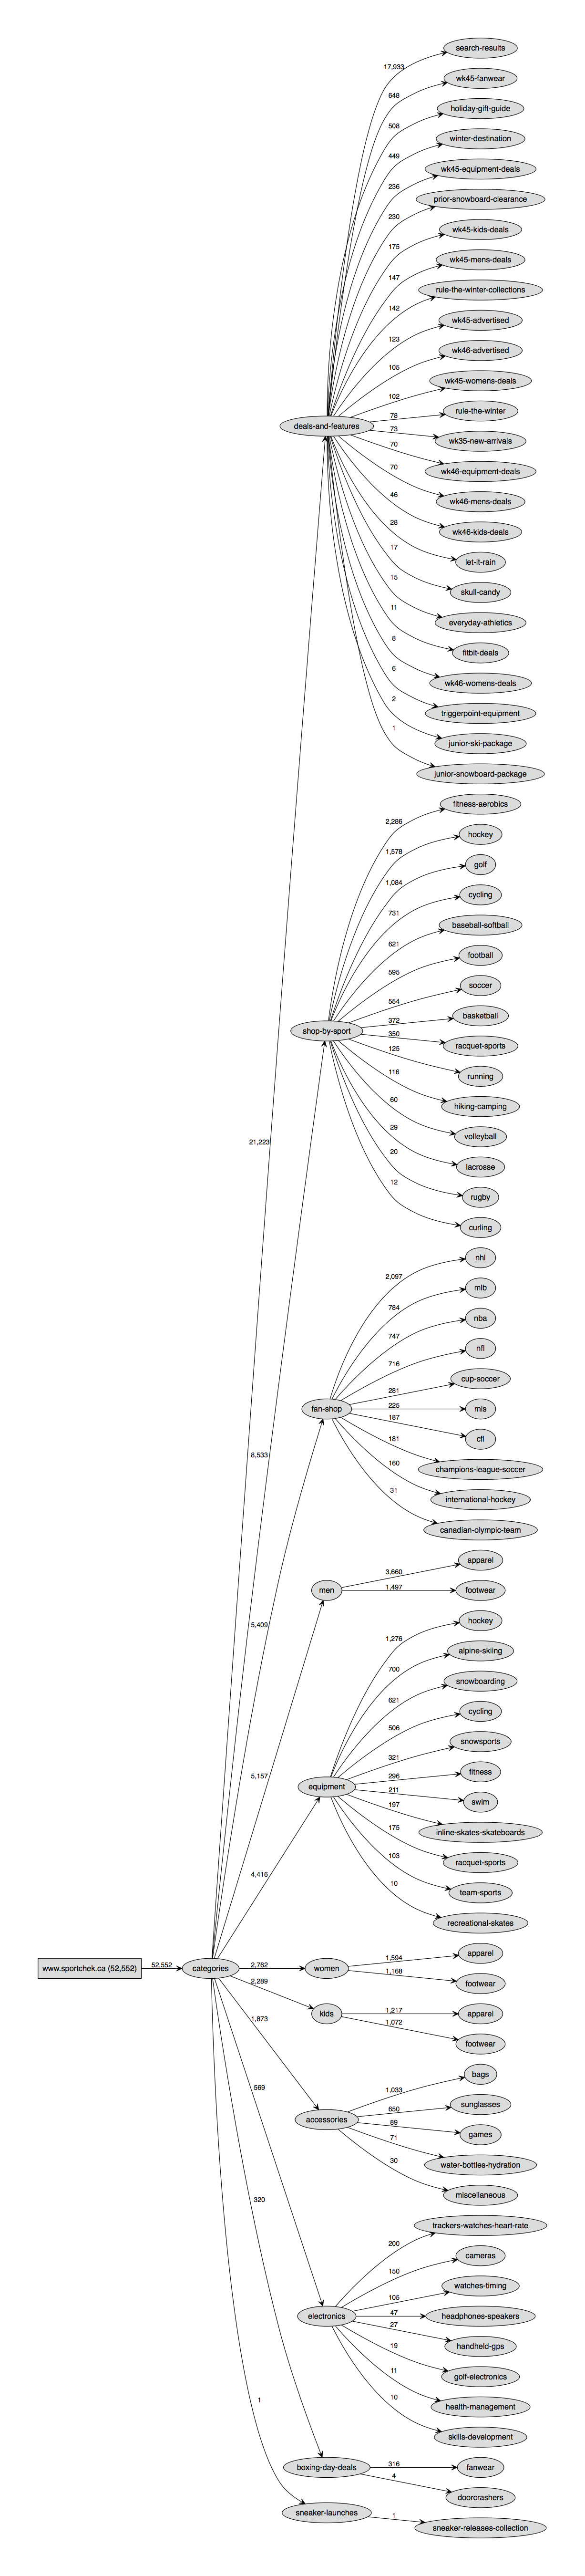 XML sitemap visualization